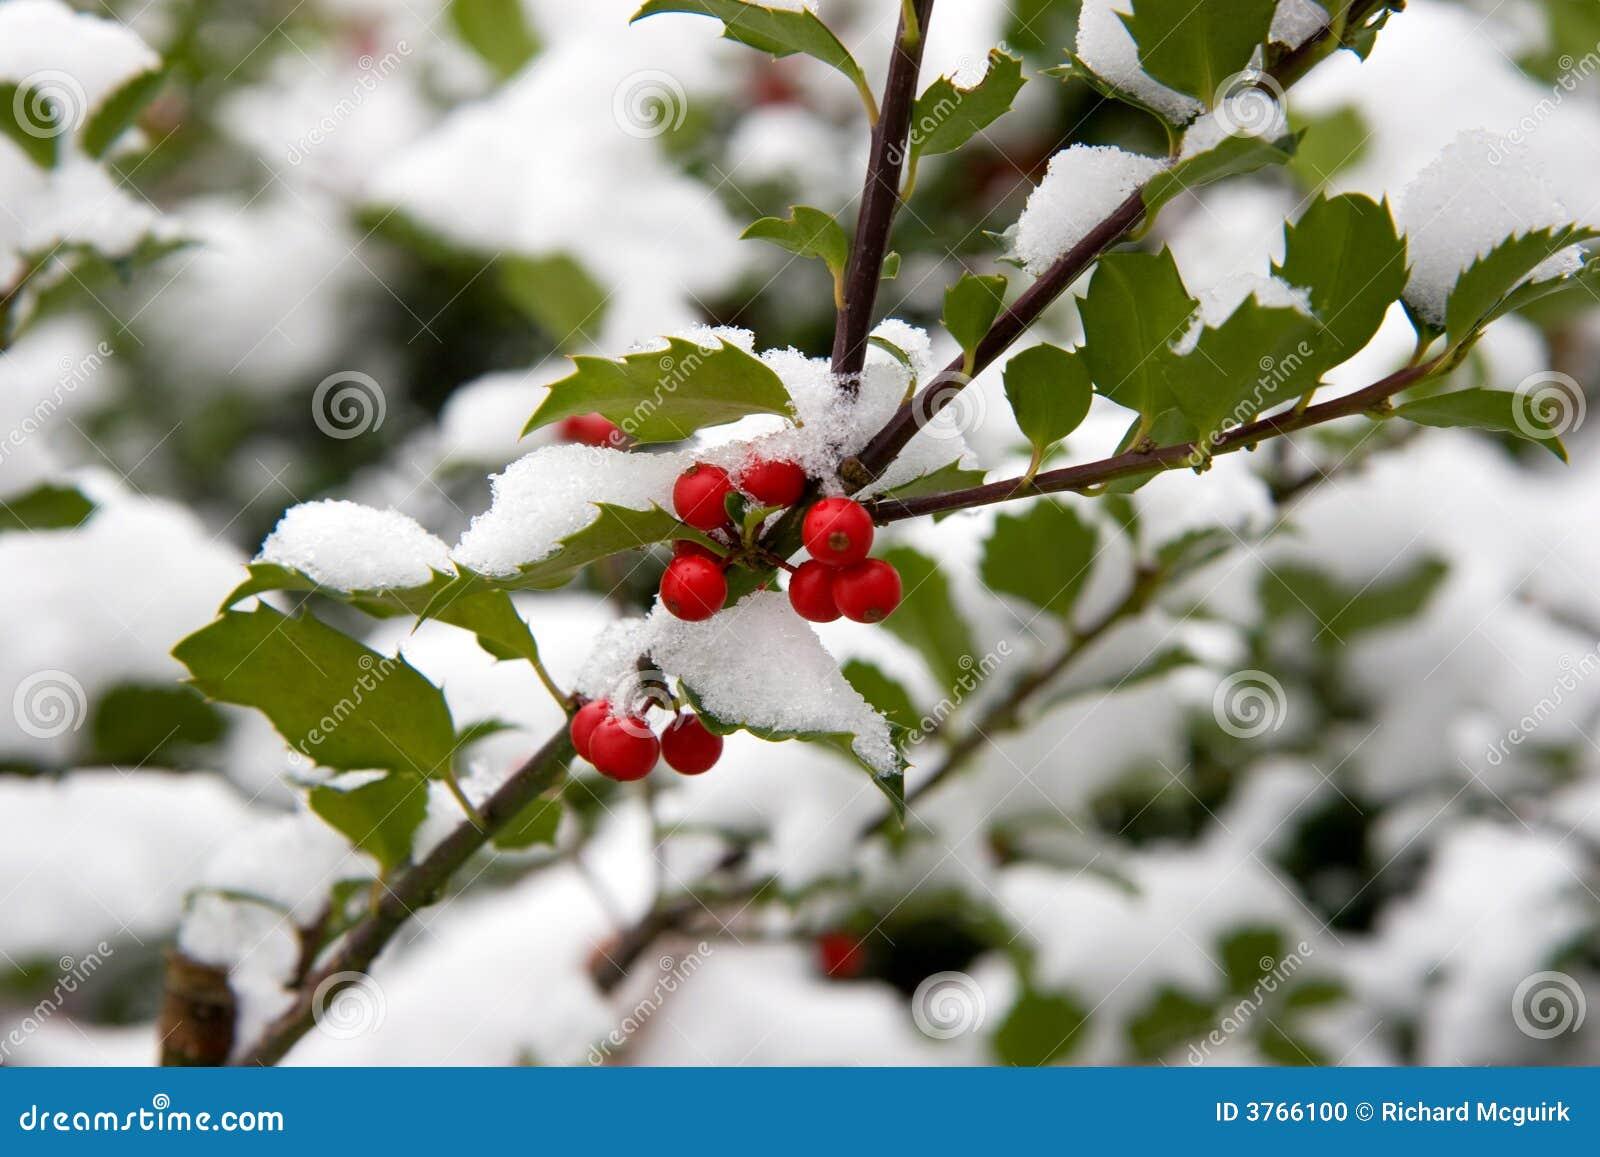 Holly Bush With Snow Stock Photo Image 3766100